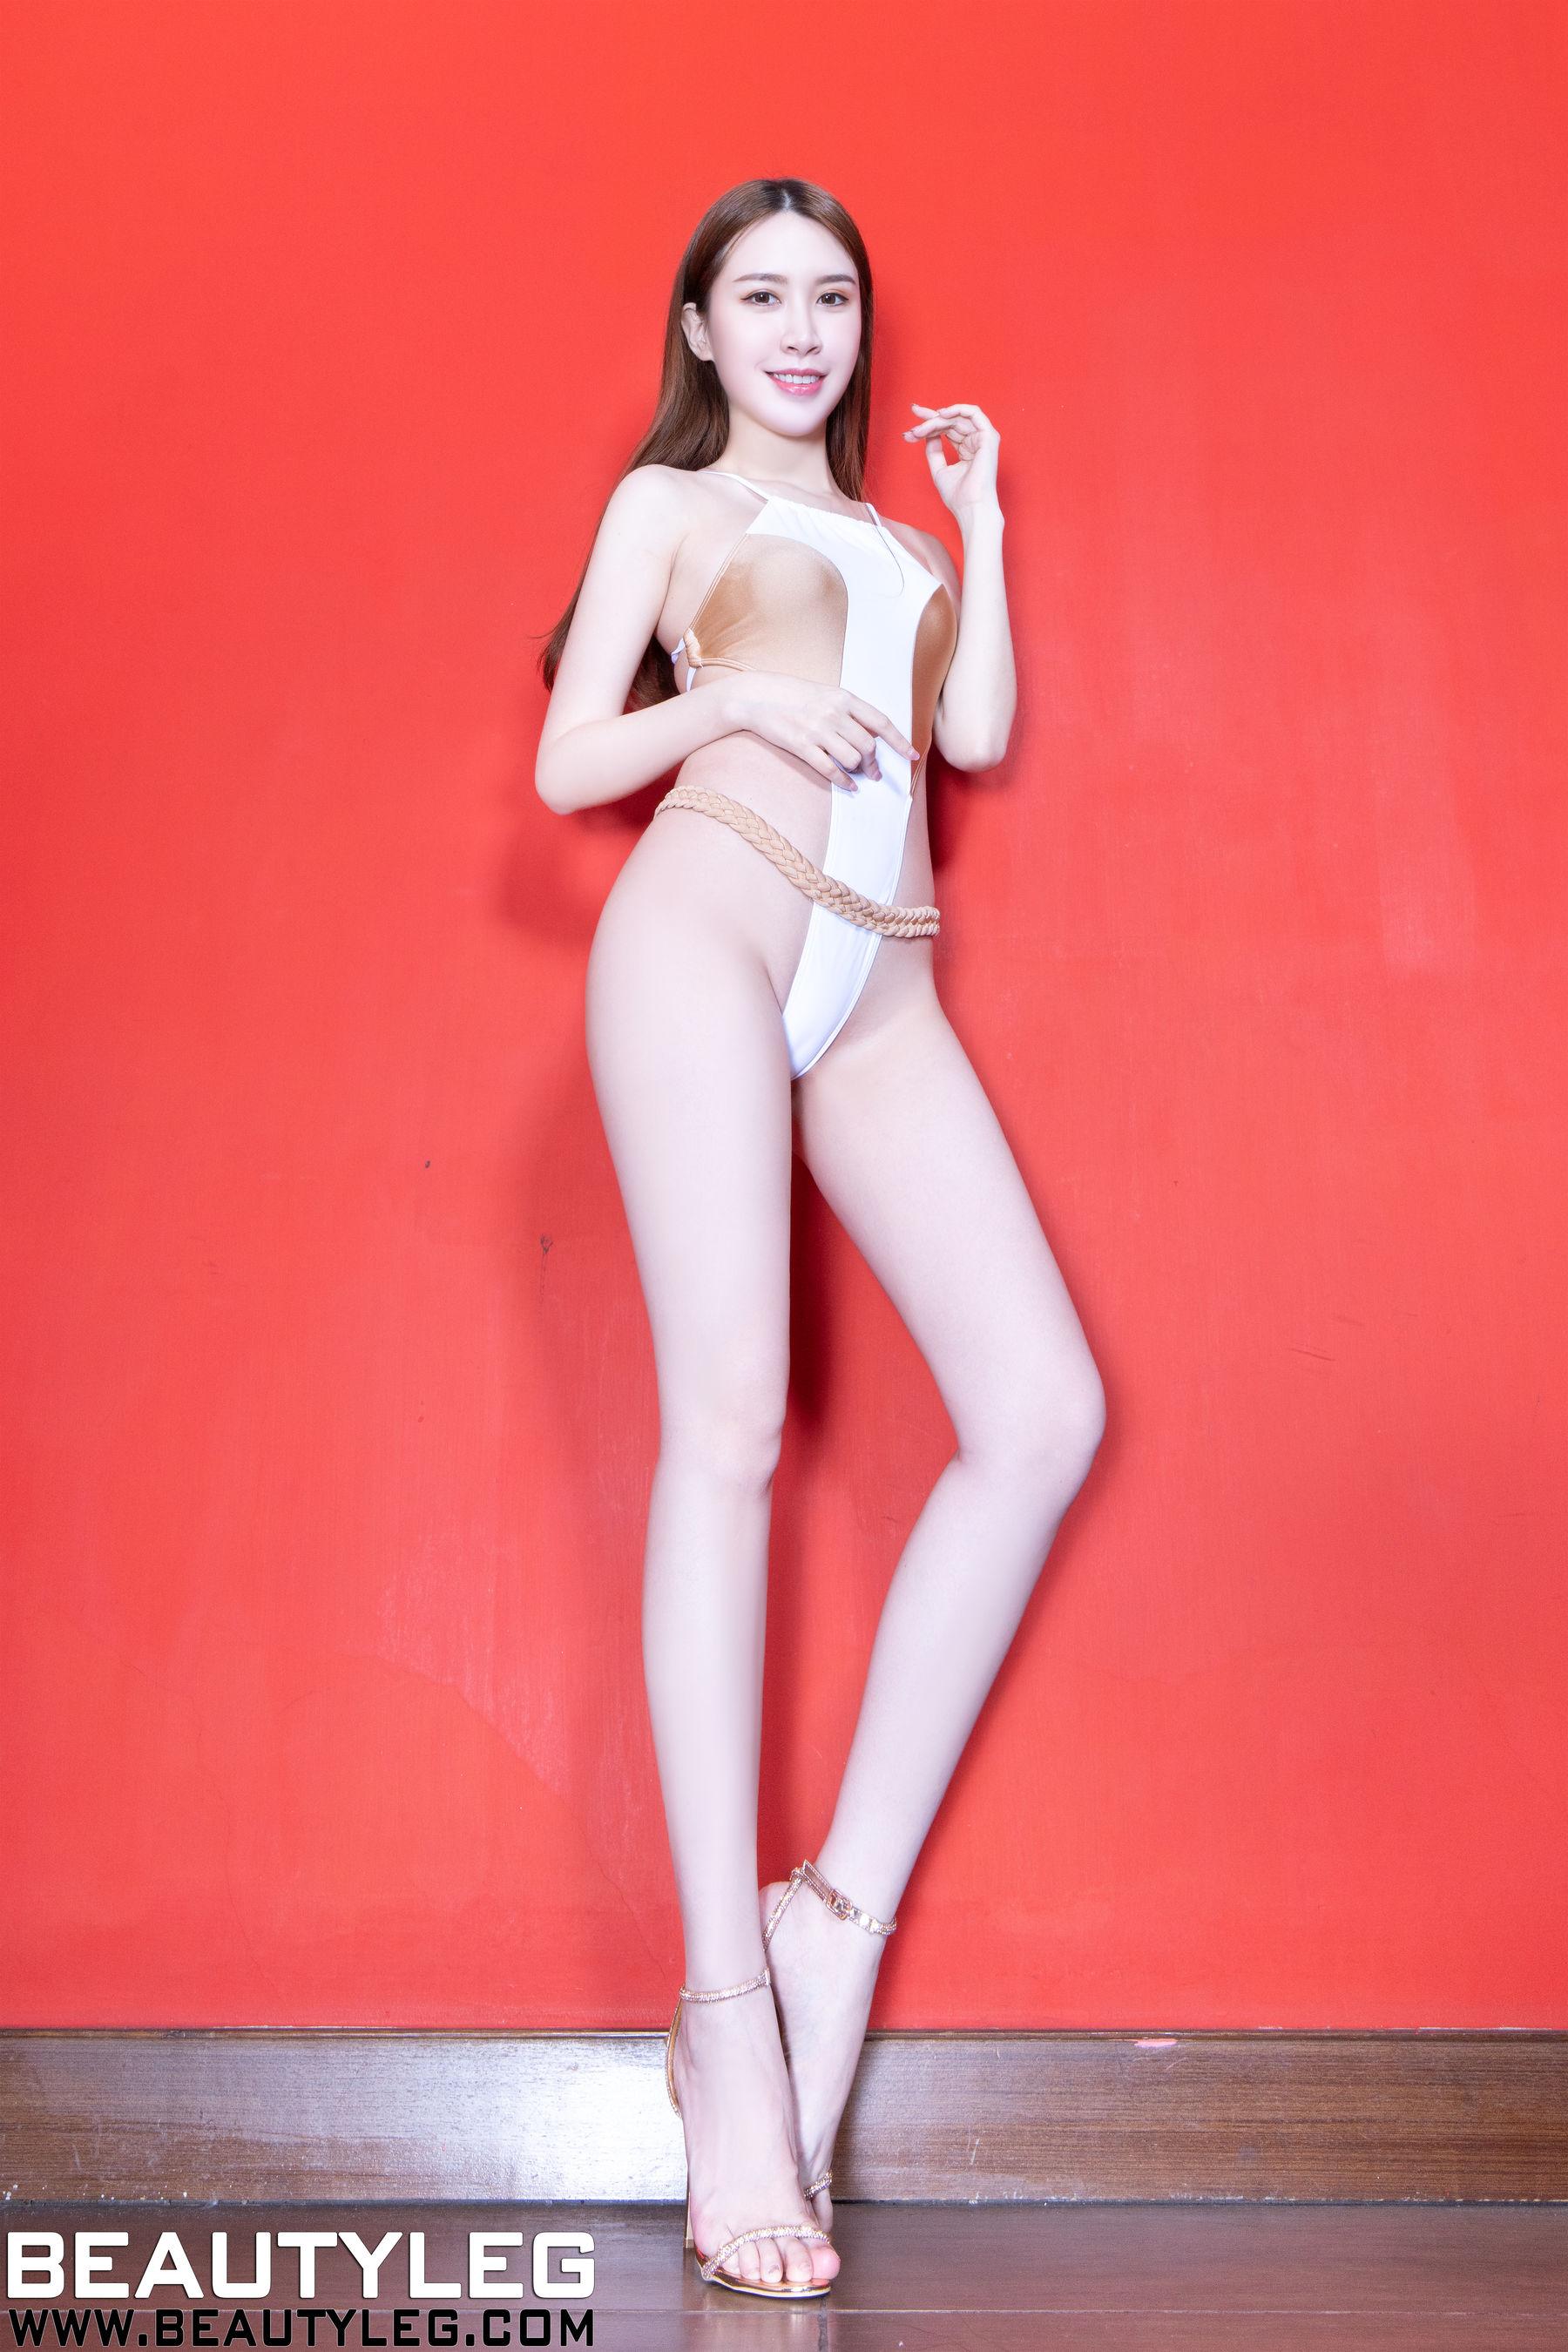 VOL.442 [Beautyleg]美腿:崔多朵(崔德蓉,腿模Stephy)超高清写真套图(20P)